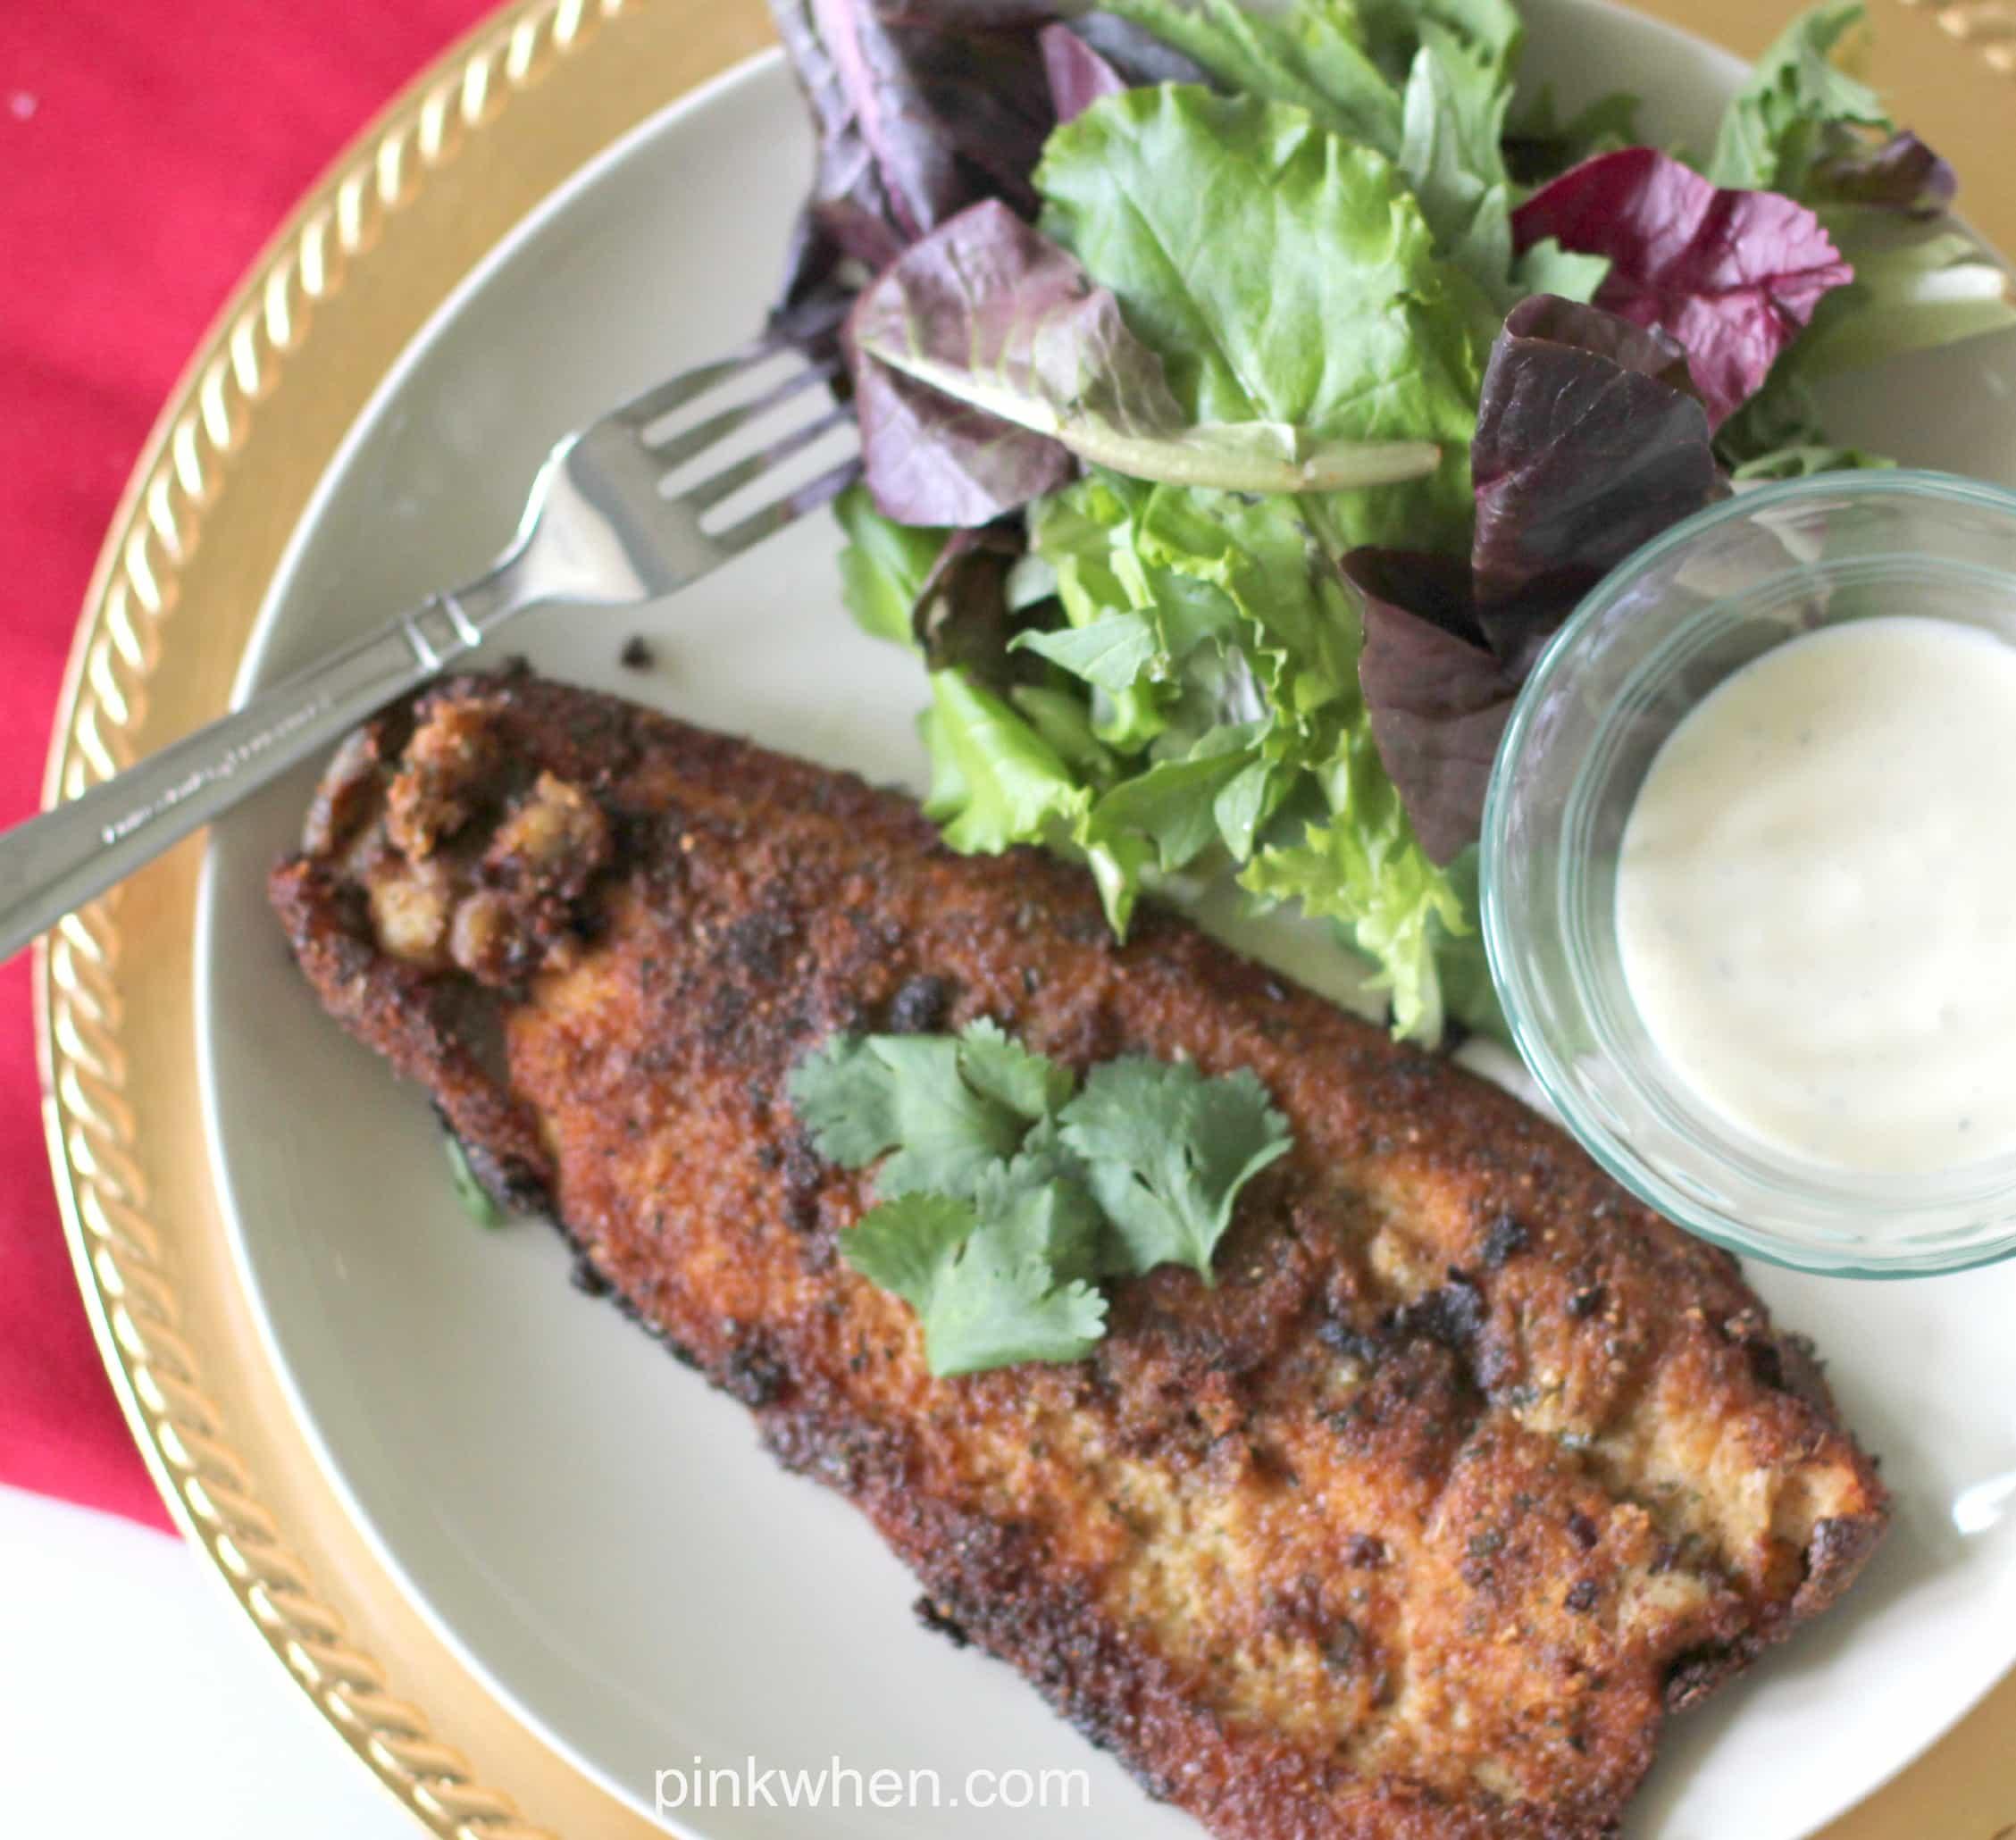 Pan fried Trout Recipe via PinkWhen.com